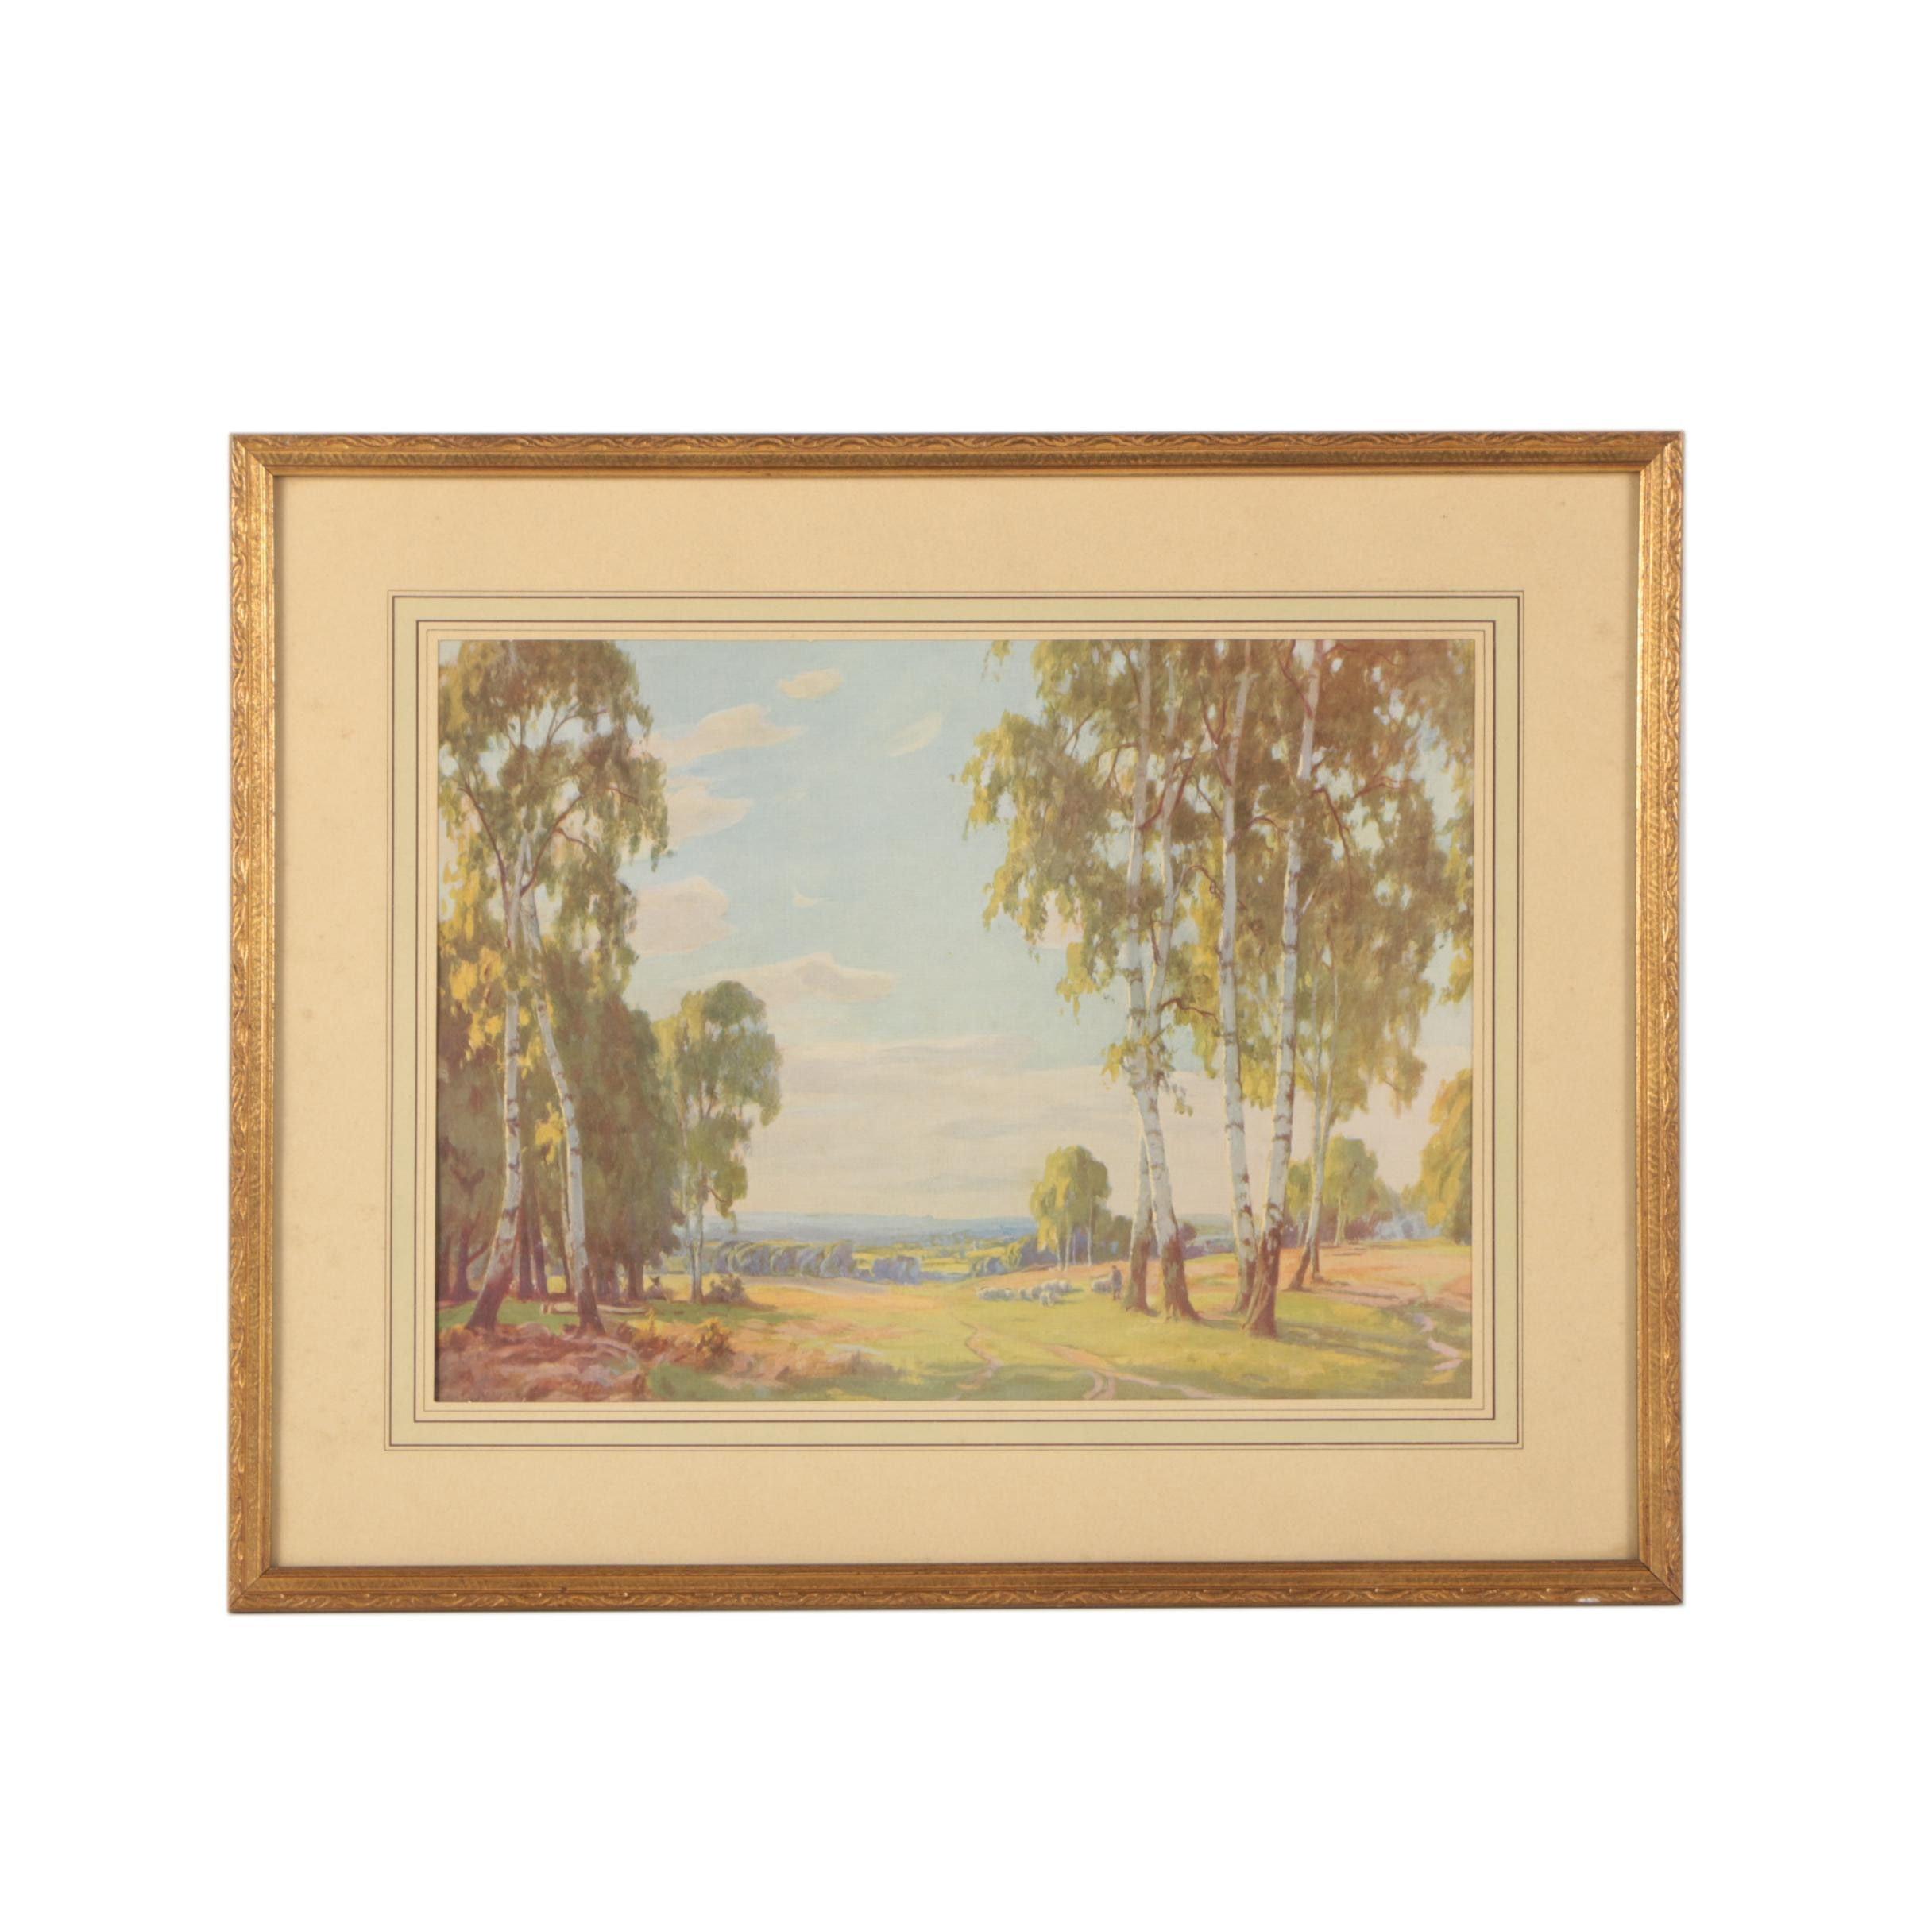 Offset Lithograph Print of a Landscape